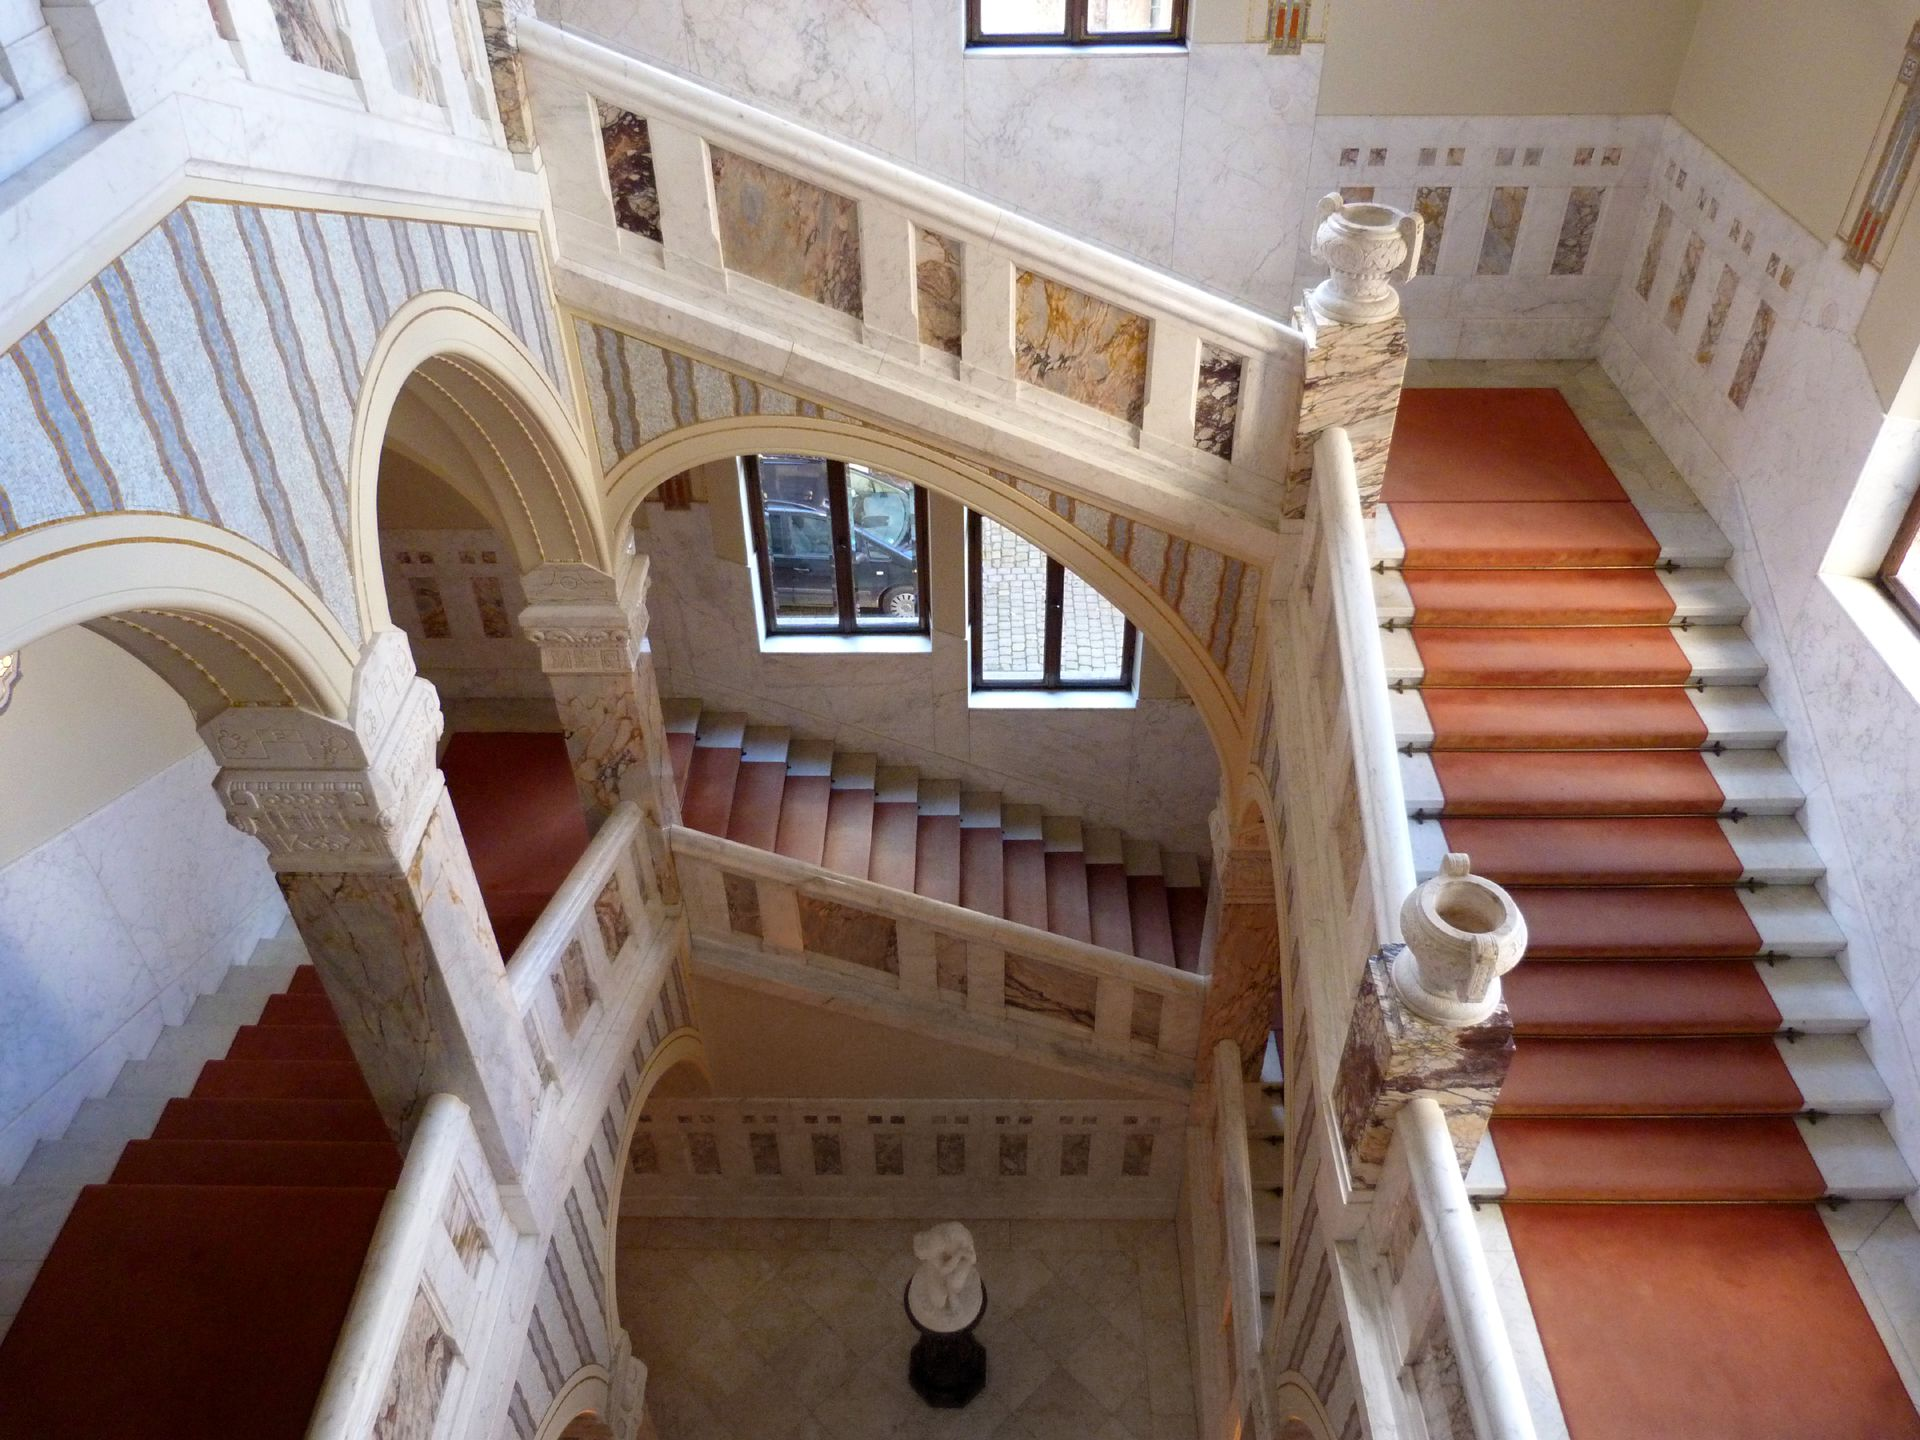 Schloss Faber-Castell Jugendstiltreppenhaus, Blick in das Treppenhaus